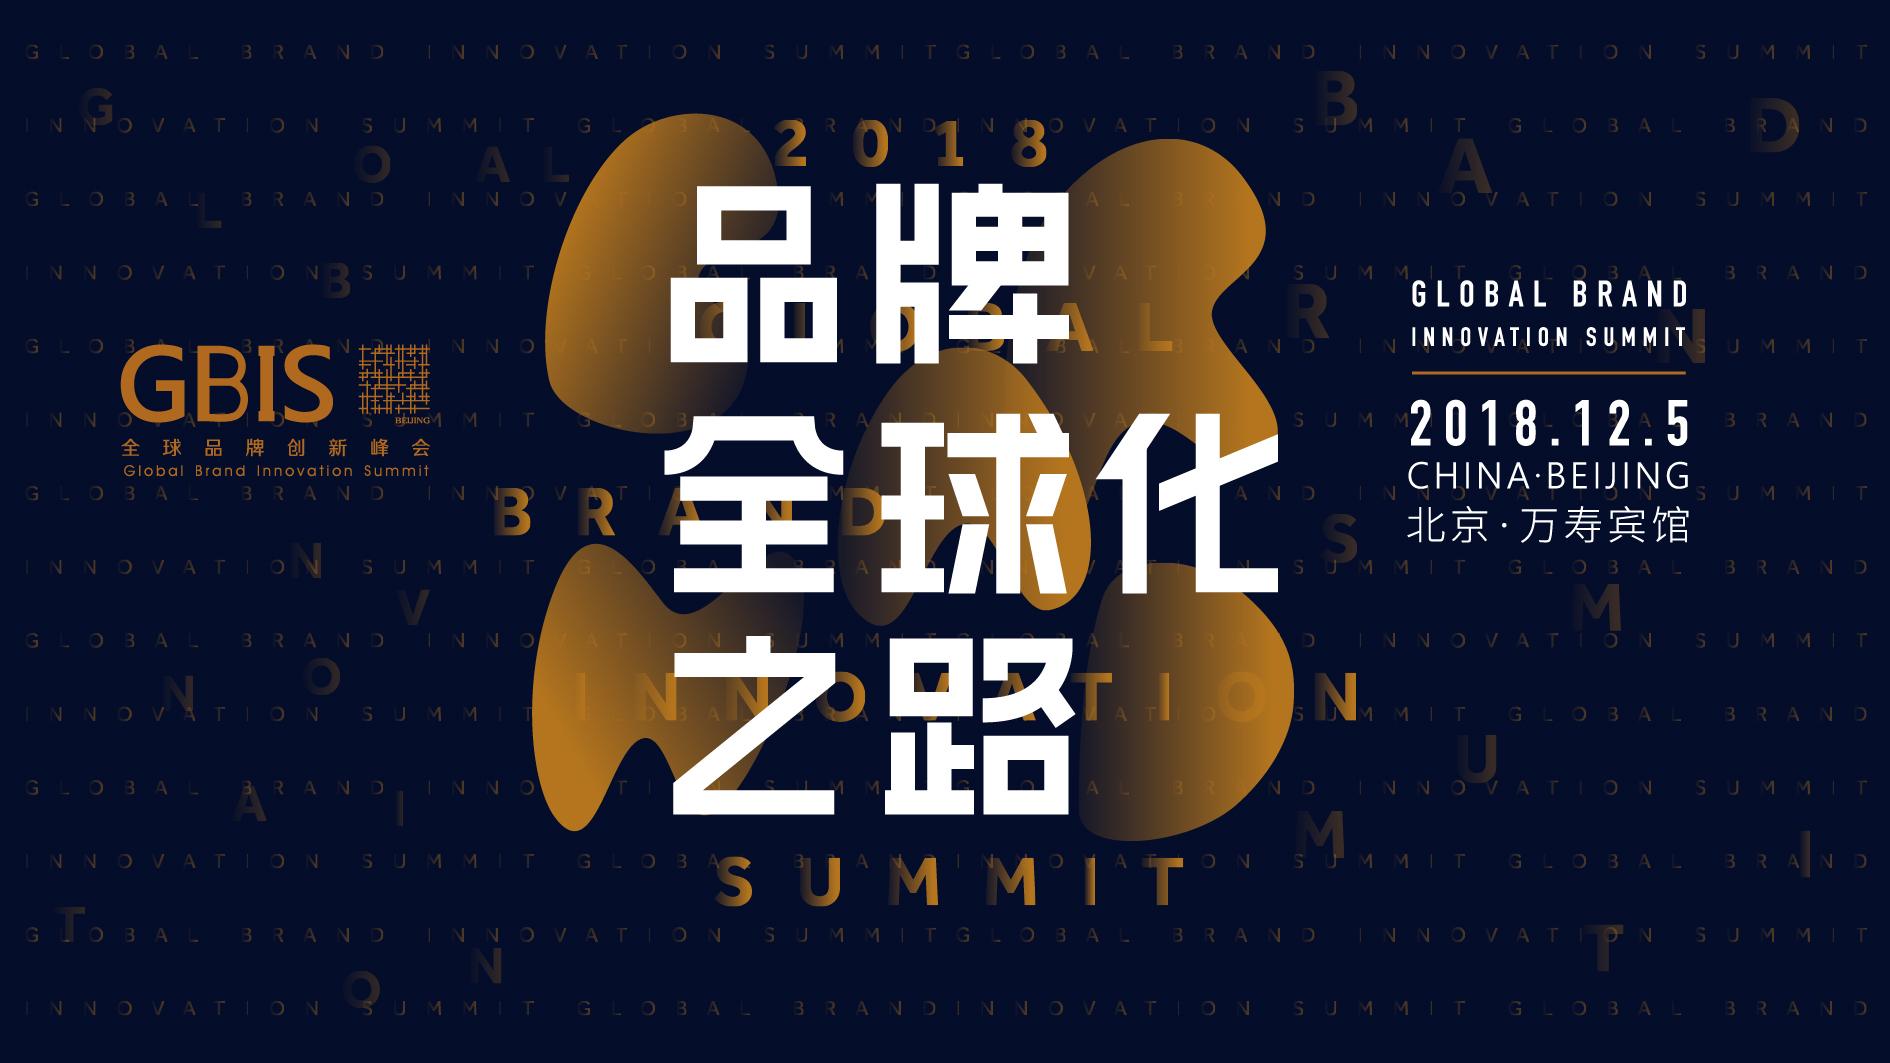 GBIS 2018全球品牌创新峰会(GlobalBrandInnovationSummit)